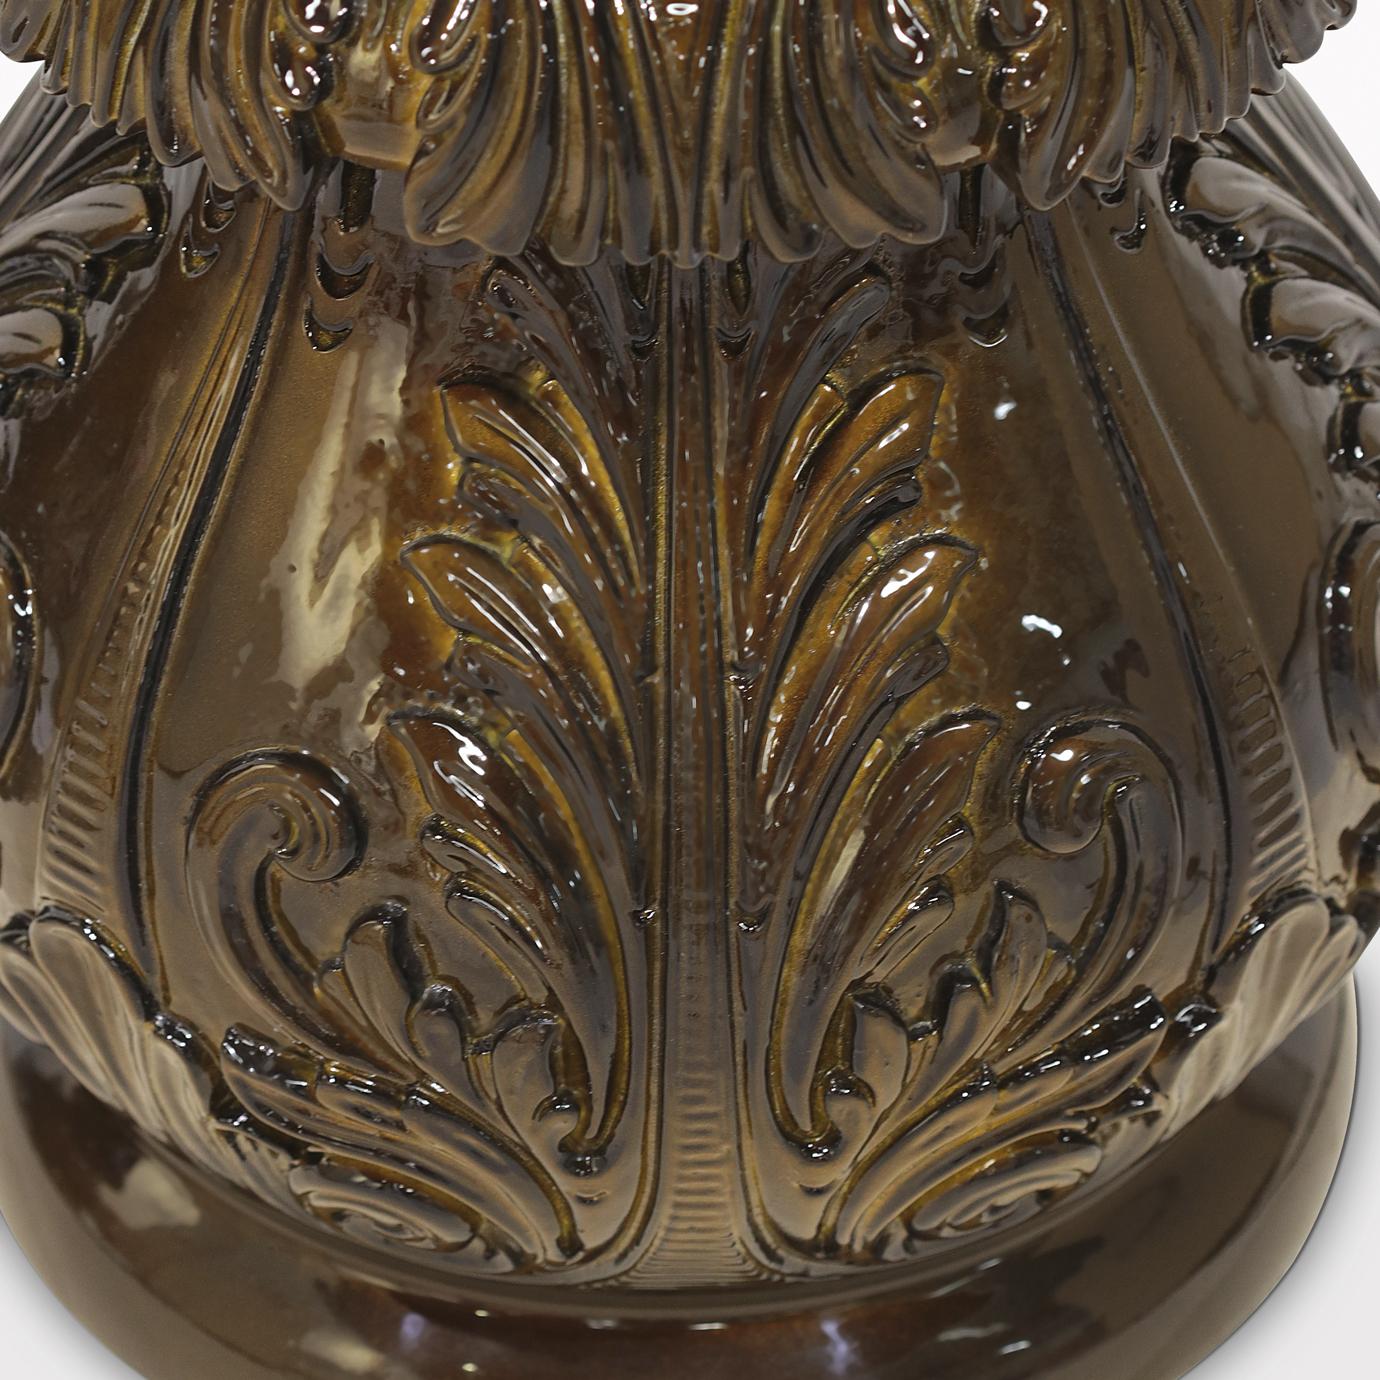 The best Portuguese Woodwork designs - Lotus Floor Lamp wood carving Ancient Art of Wood Carving Represented at Maison et Objet 2019 Lotus Floor Lamp Ancient Art of Wood Carving Represented at Maison et Objet 2019